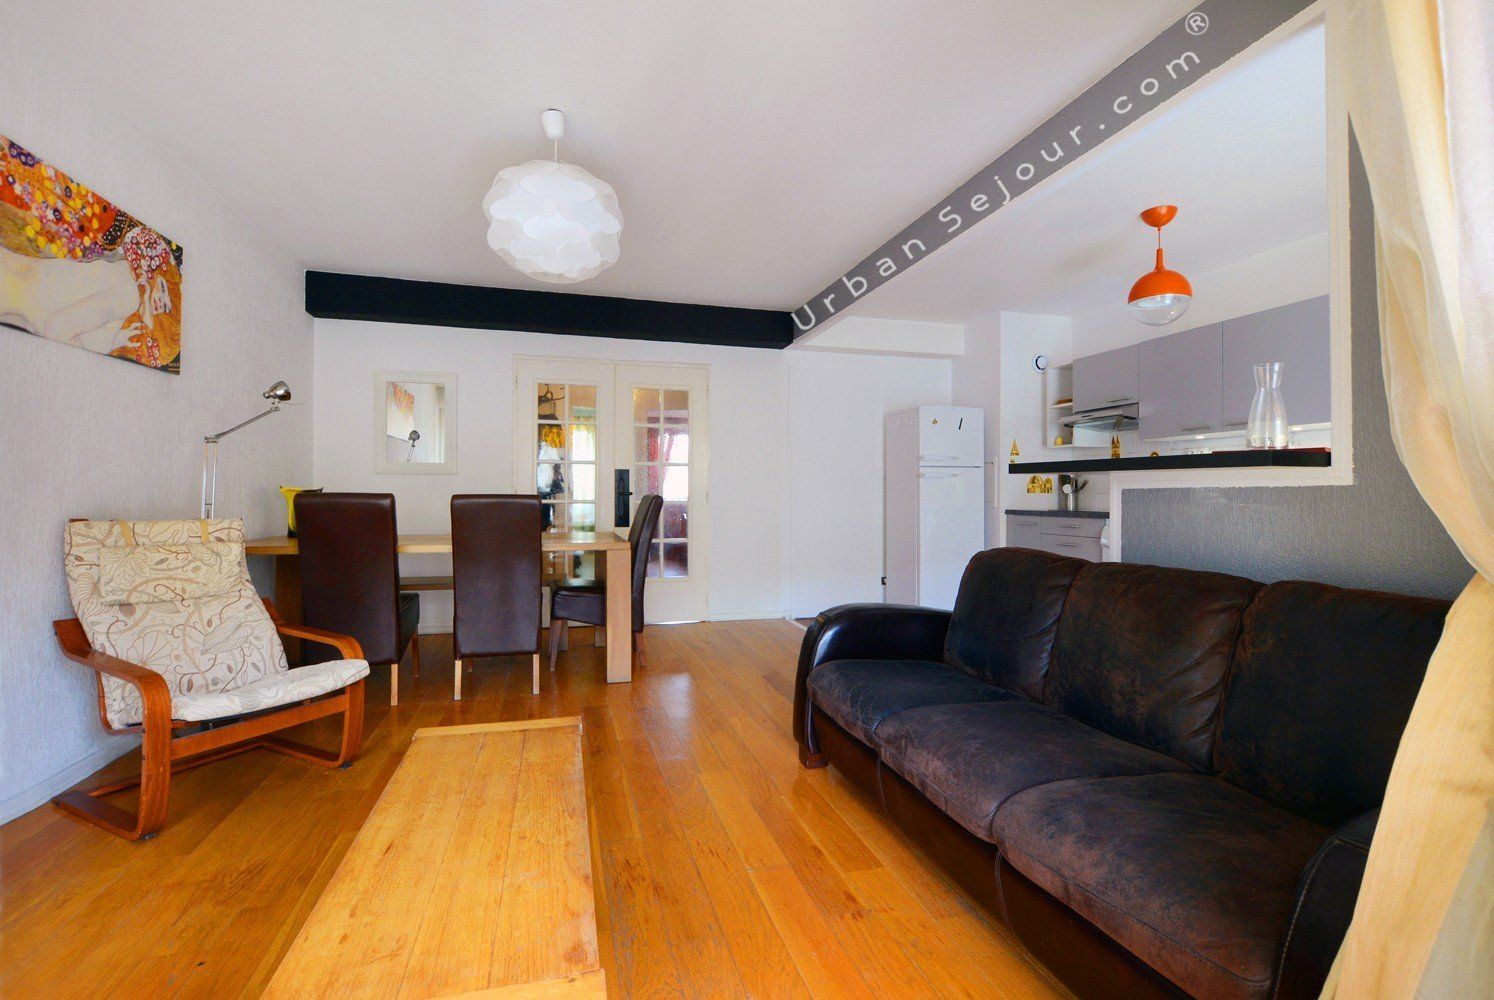 lyon 7 garibaldi universit urban s jour. Black Bedroom Furniture Sets. Home Design Ideas